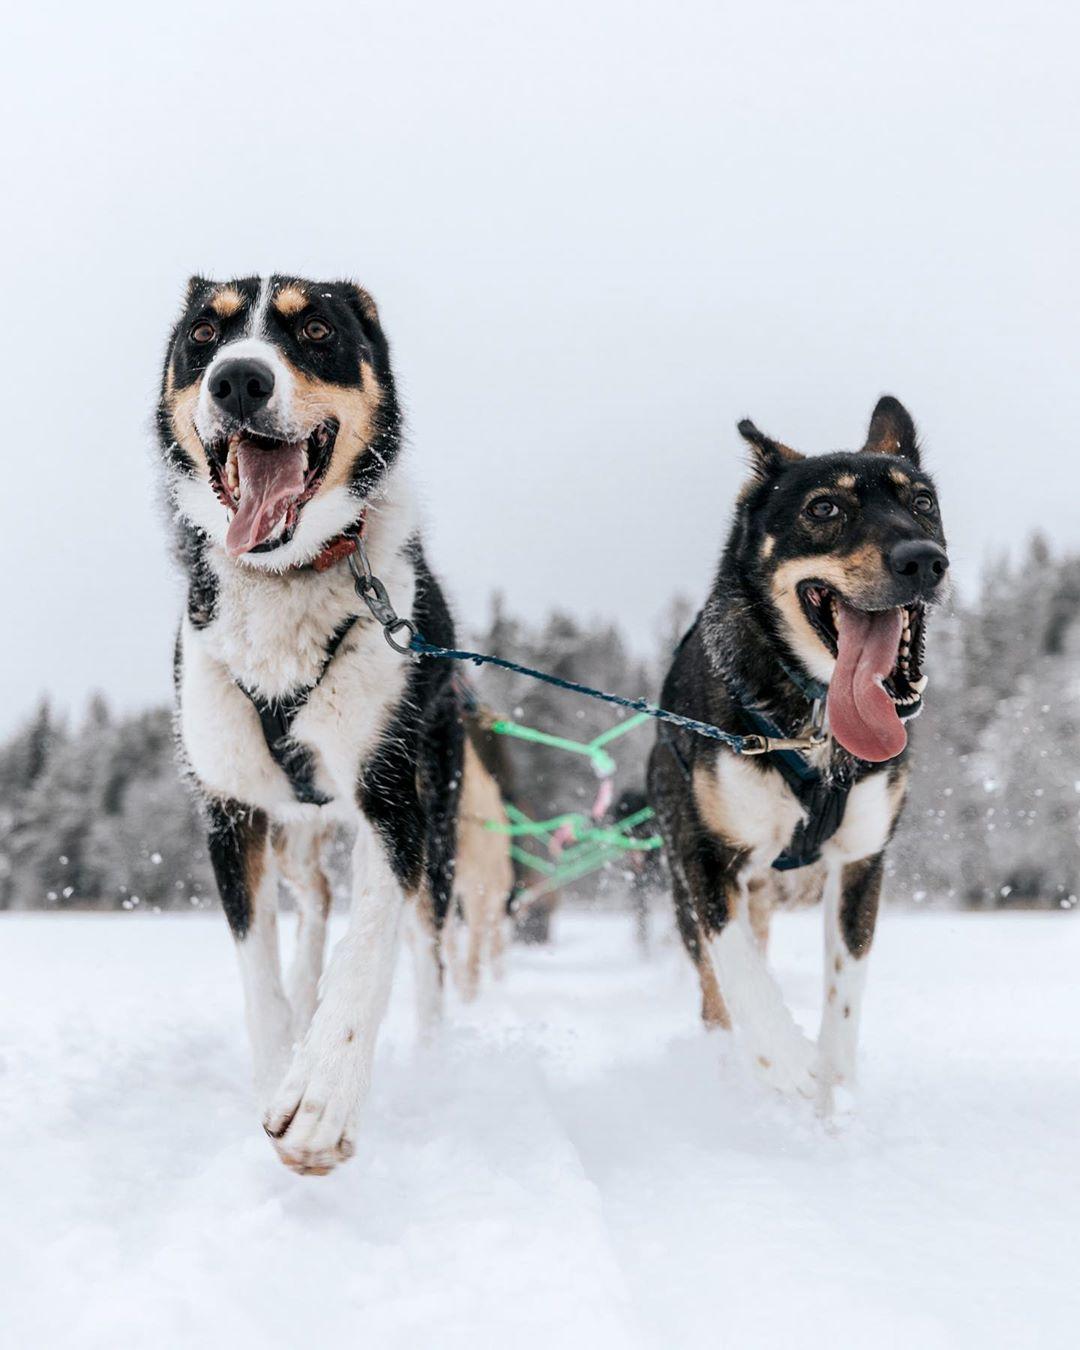 Bearhill Husky Dogs Running Rovaniemi Lapland Finland